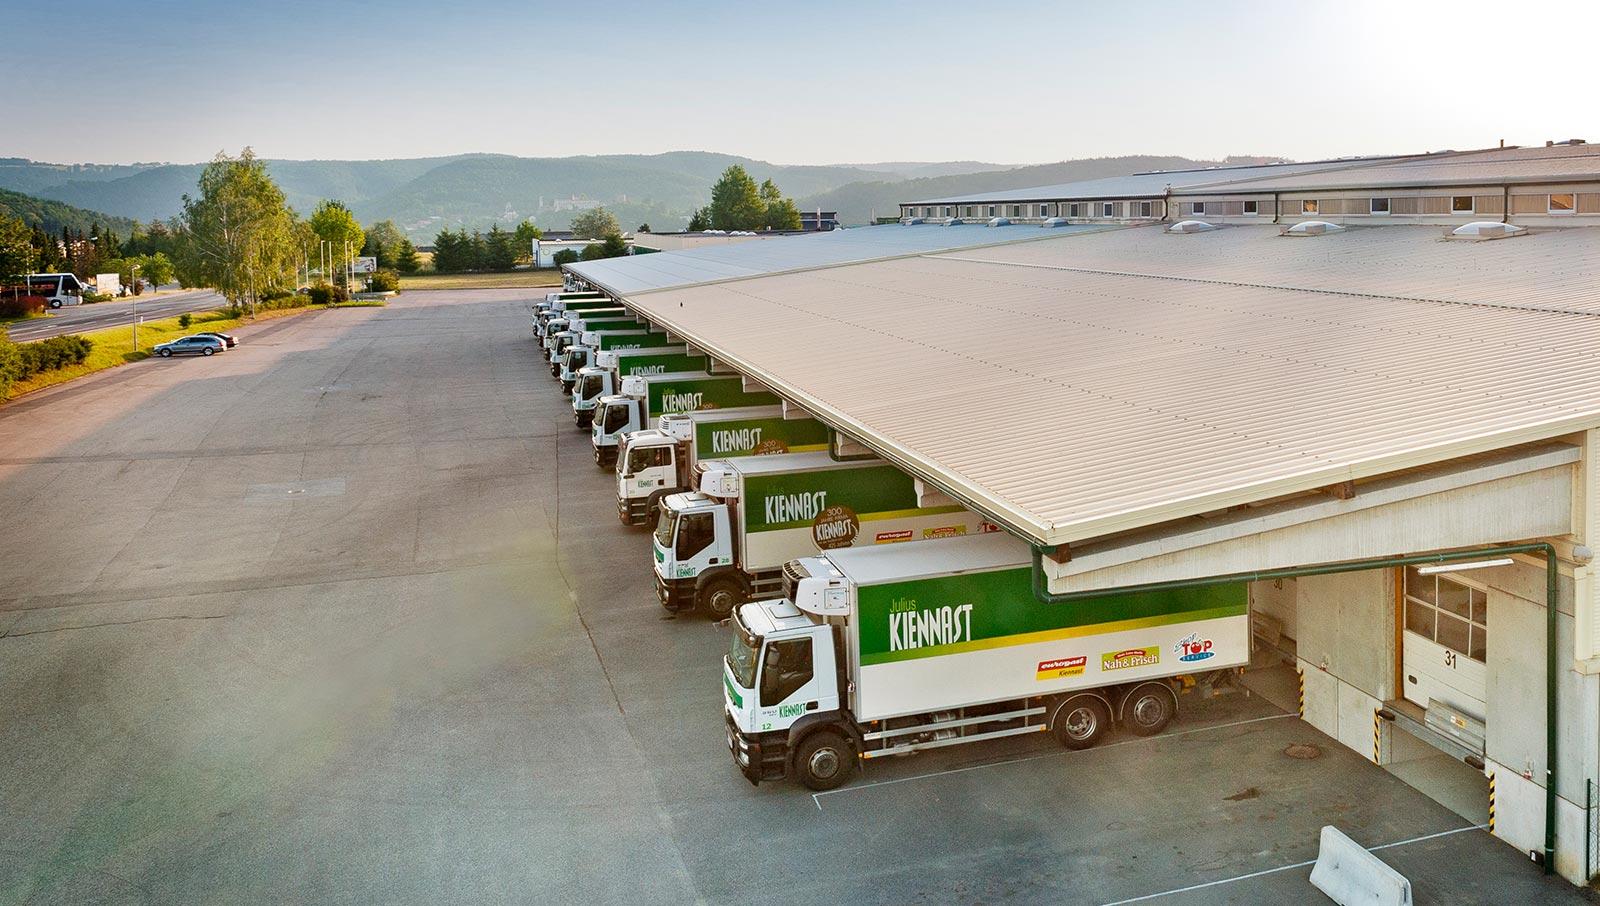 Logistik von Kiennast. © Reinhard Podolsky/mediadesign